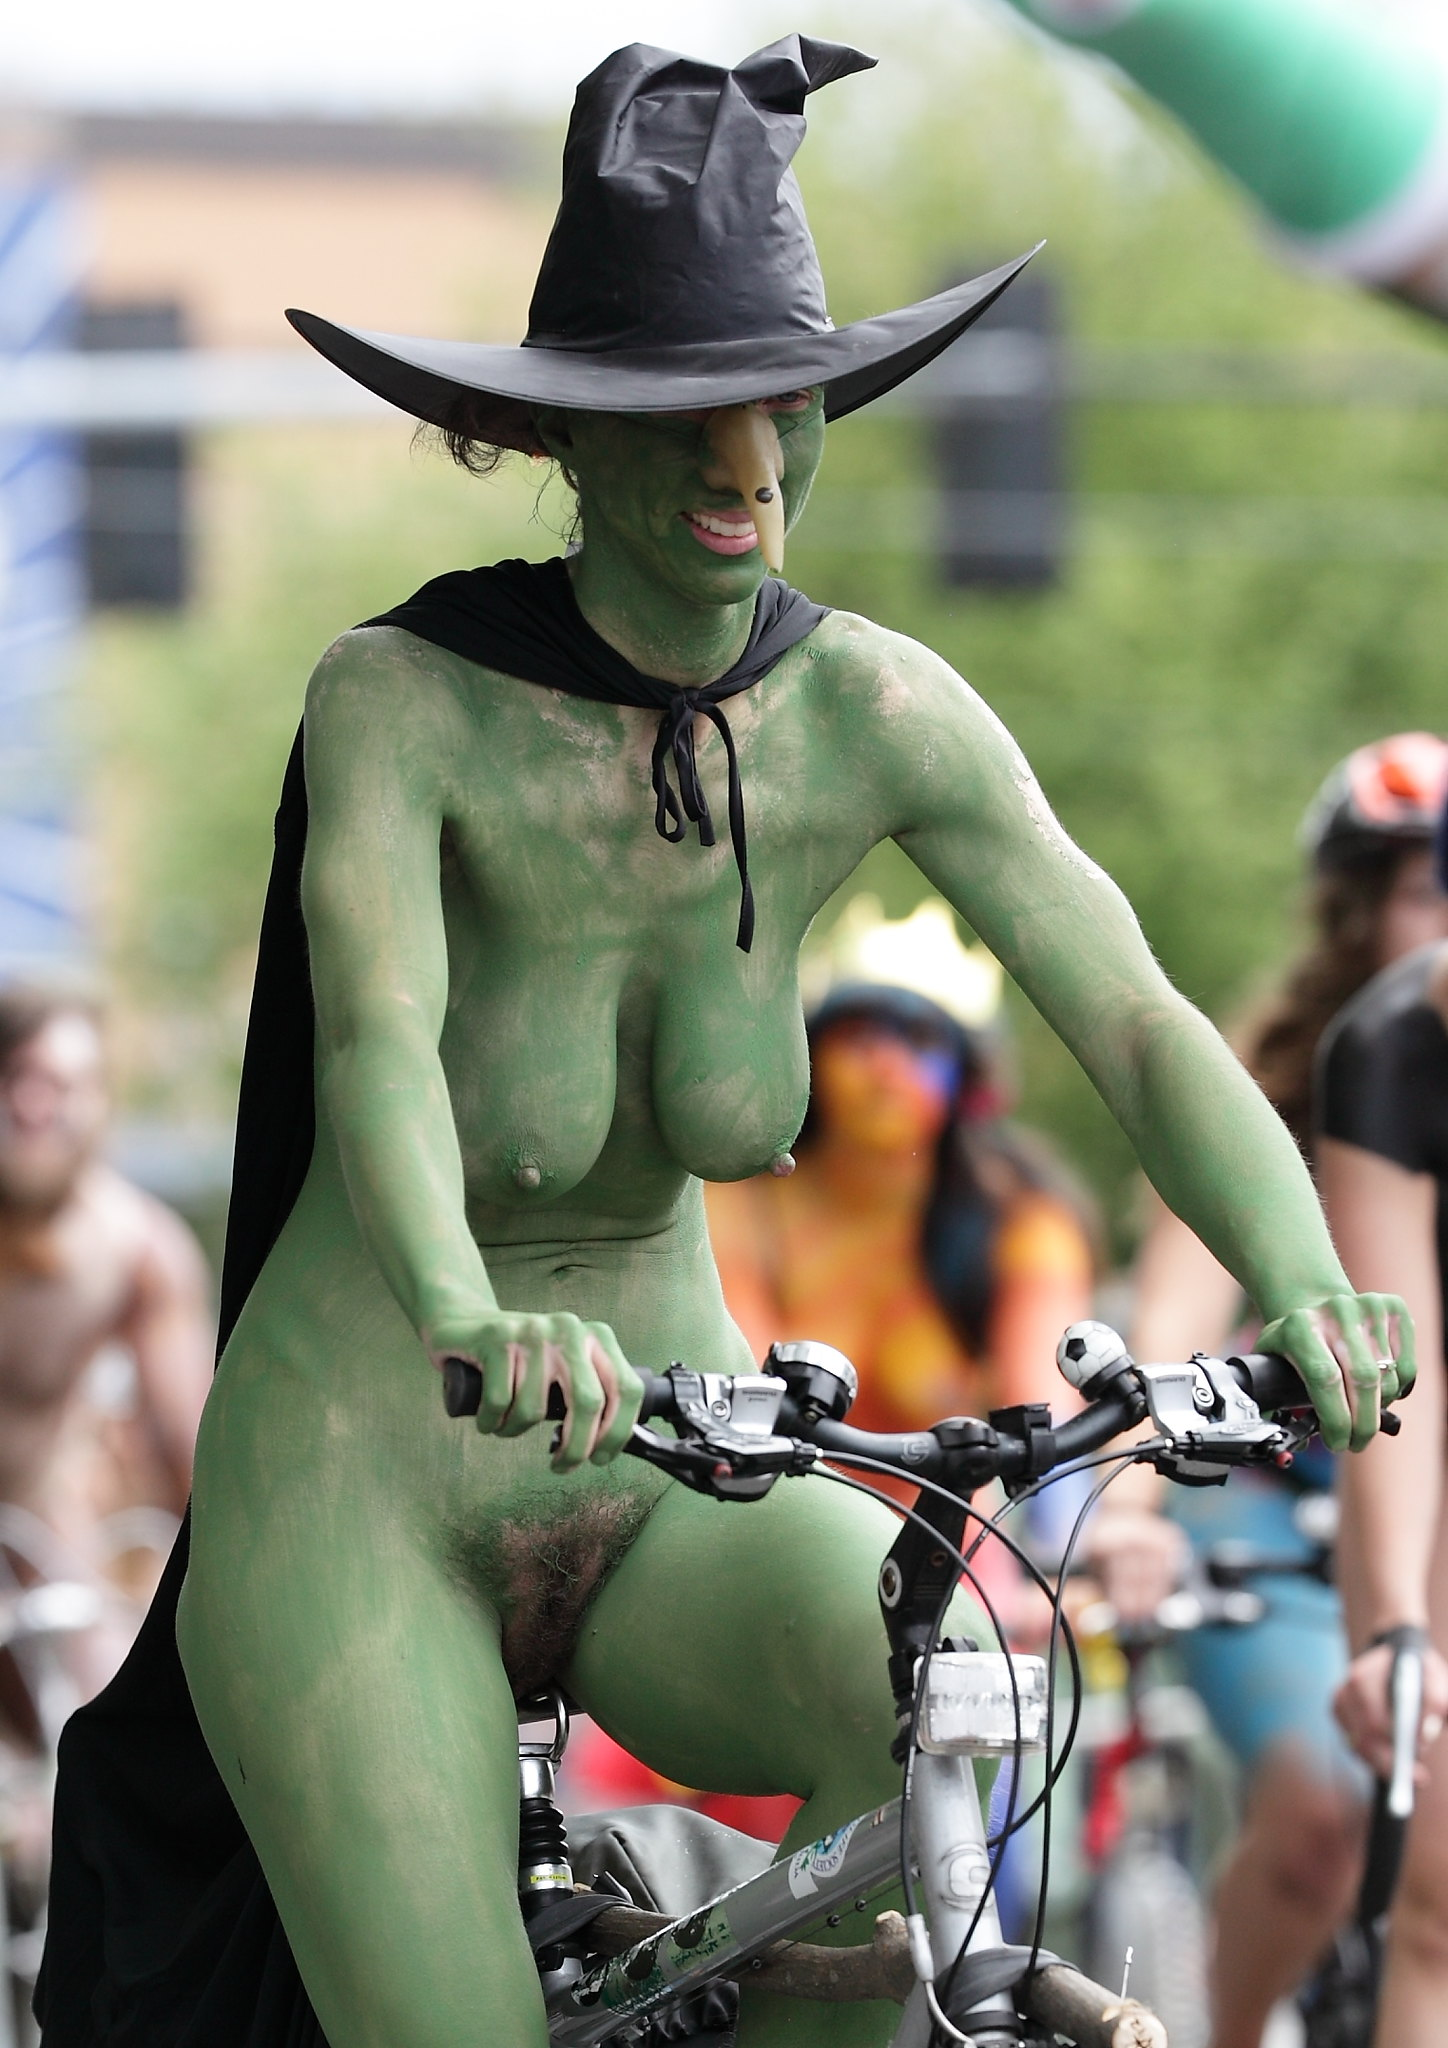 Naked Bike Parade 22